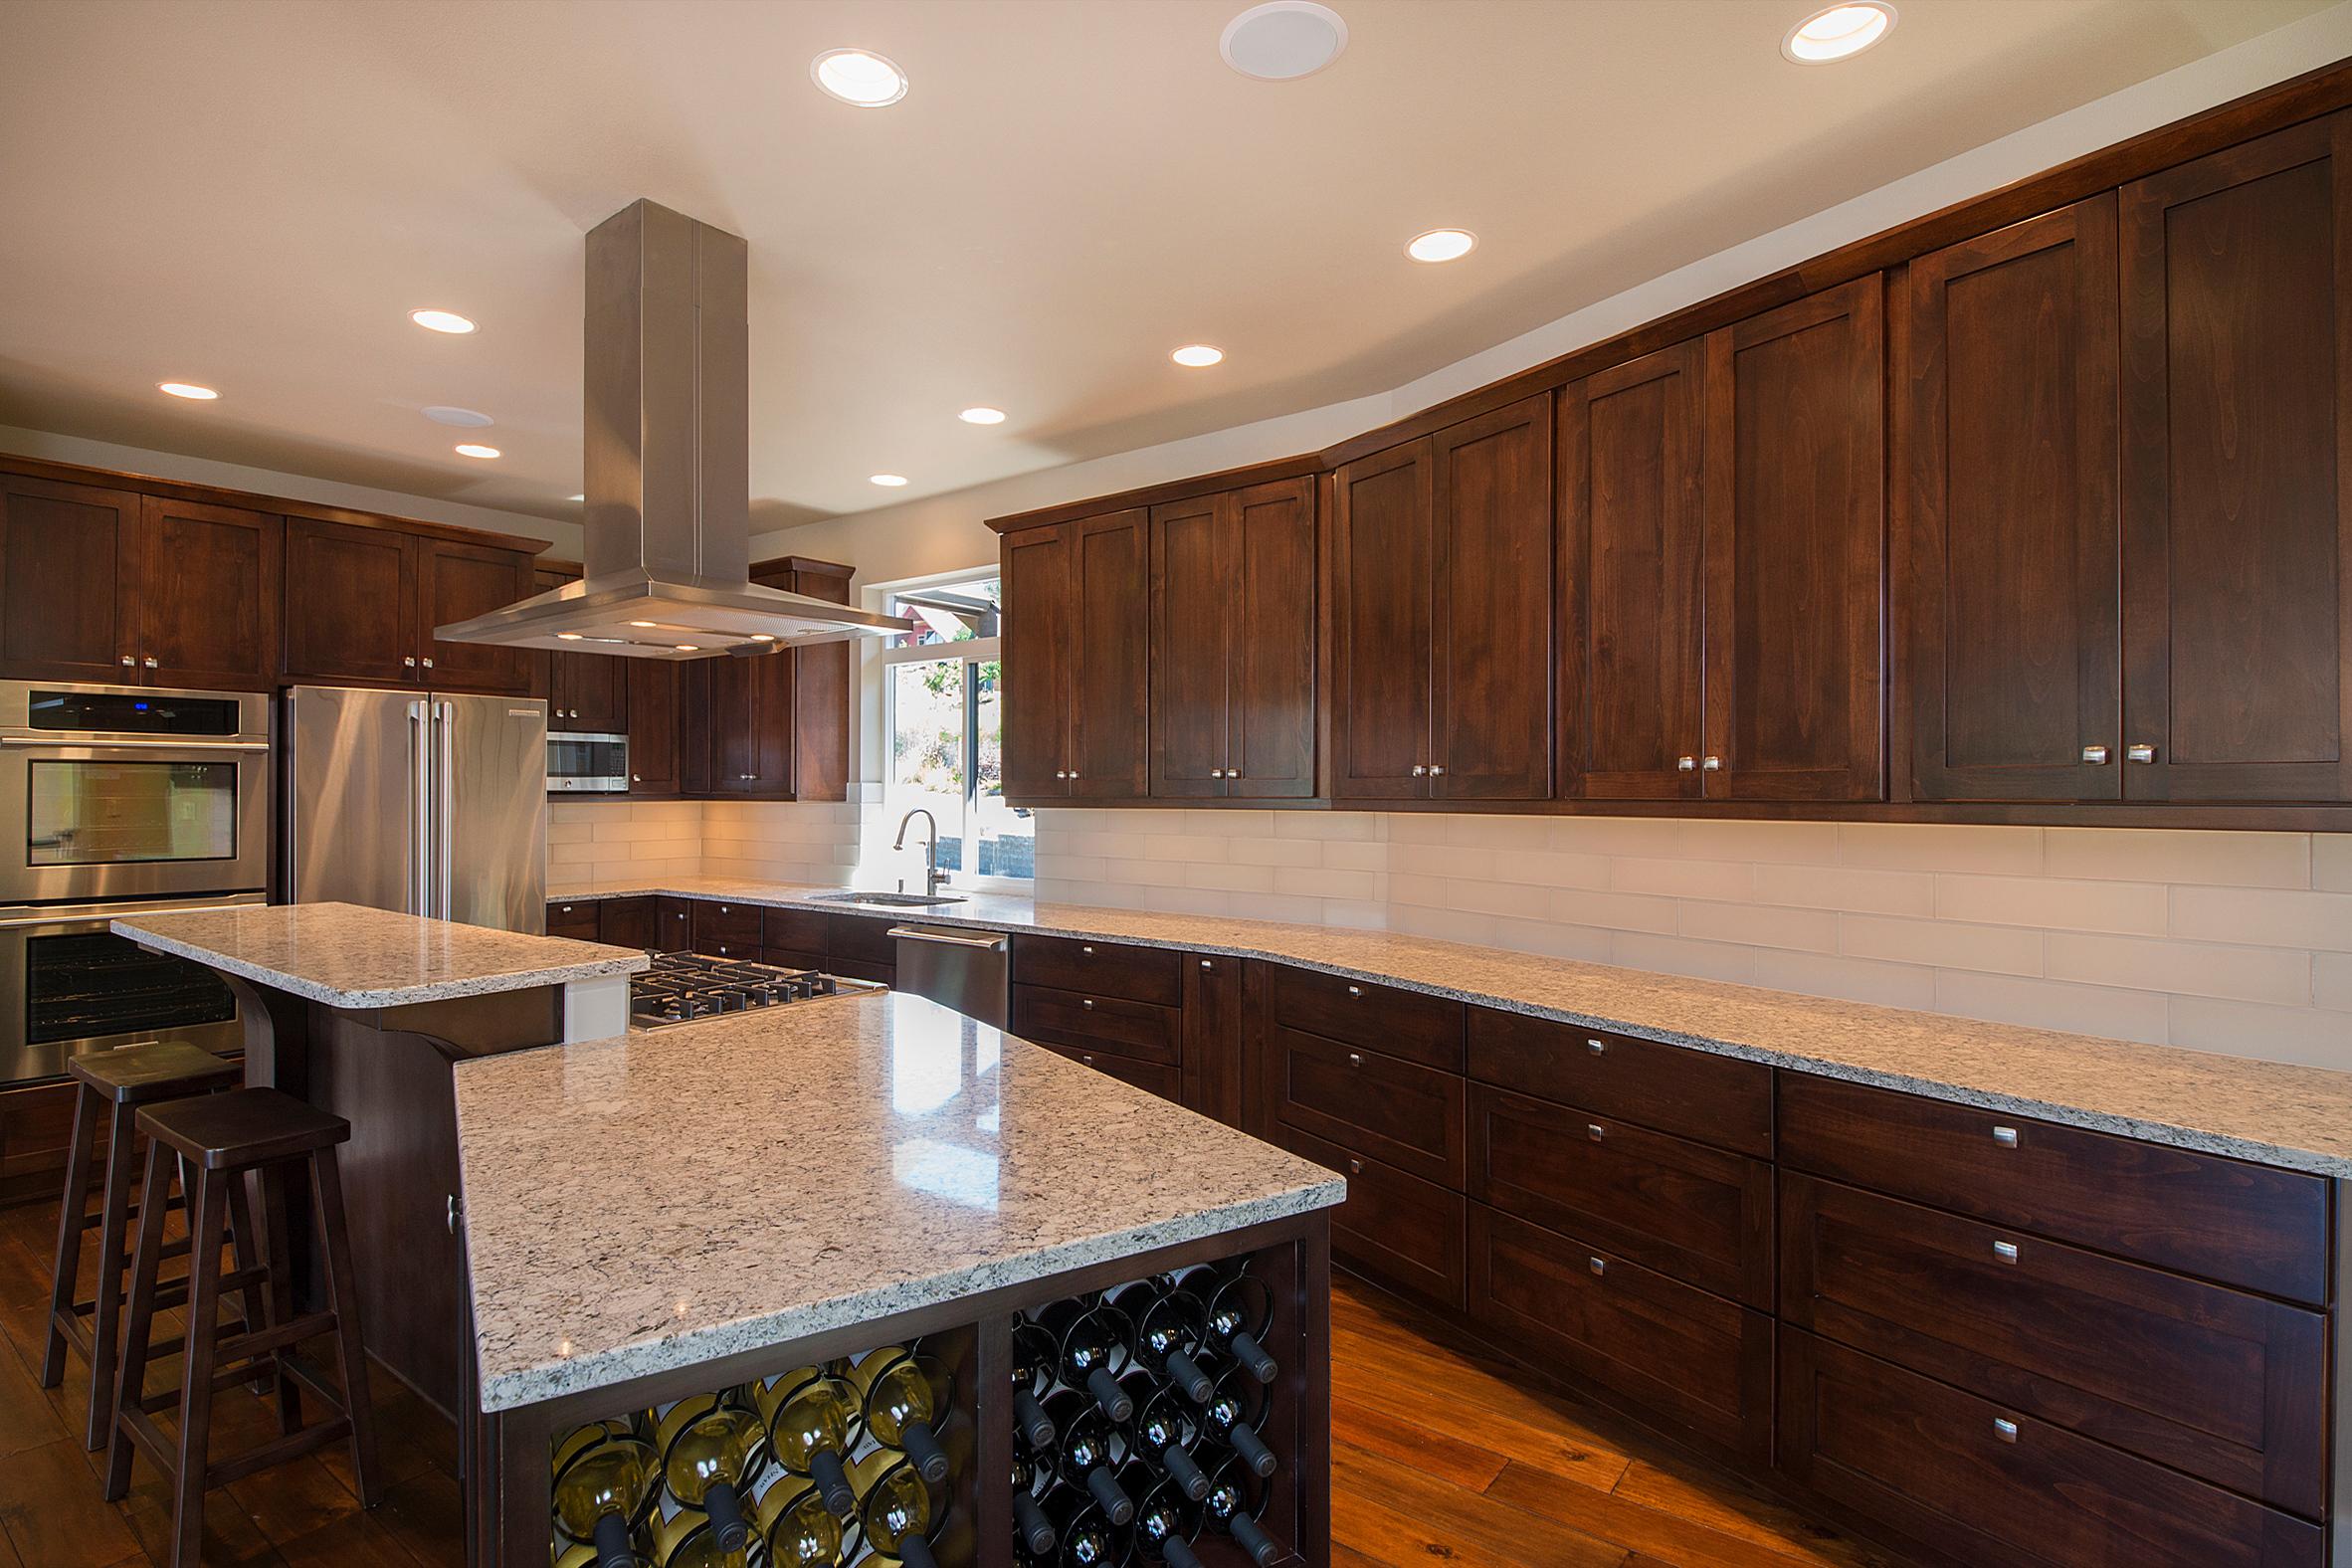 kitchen+2-3418586987-O.jpg